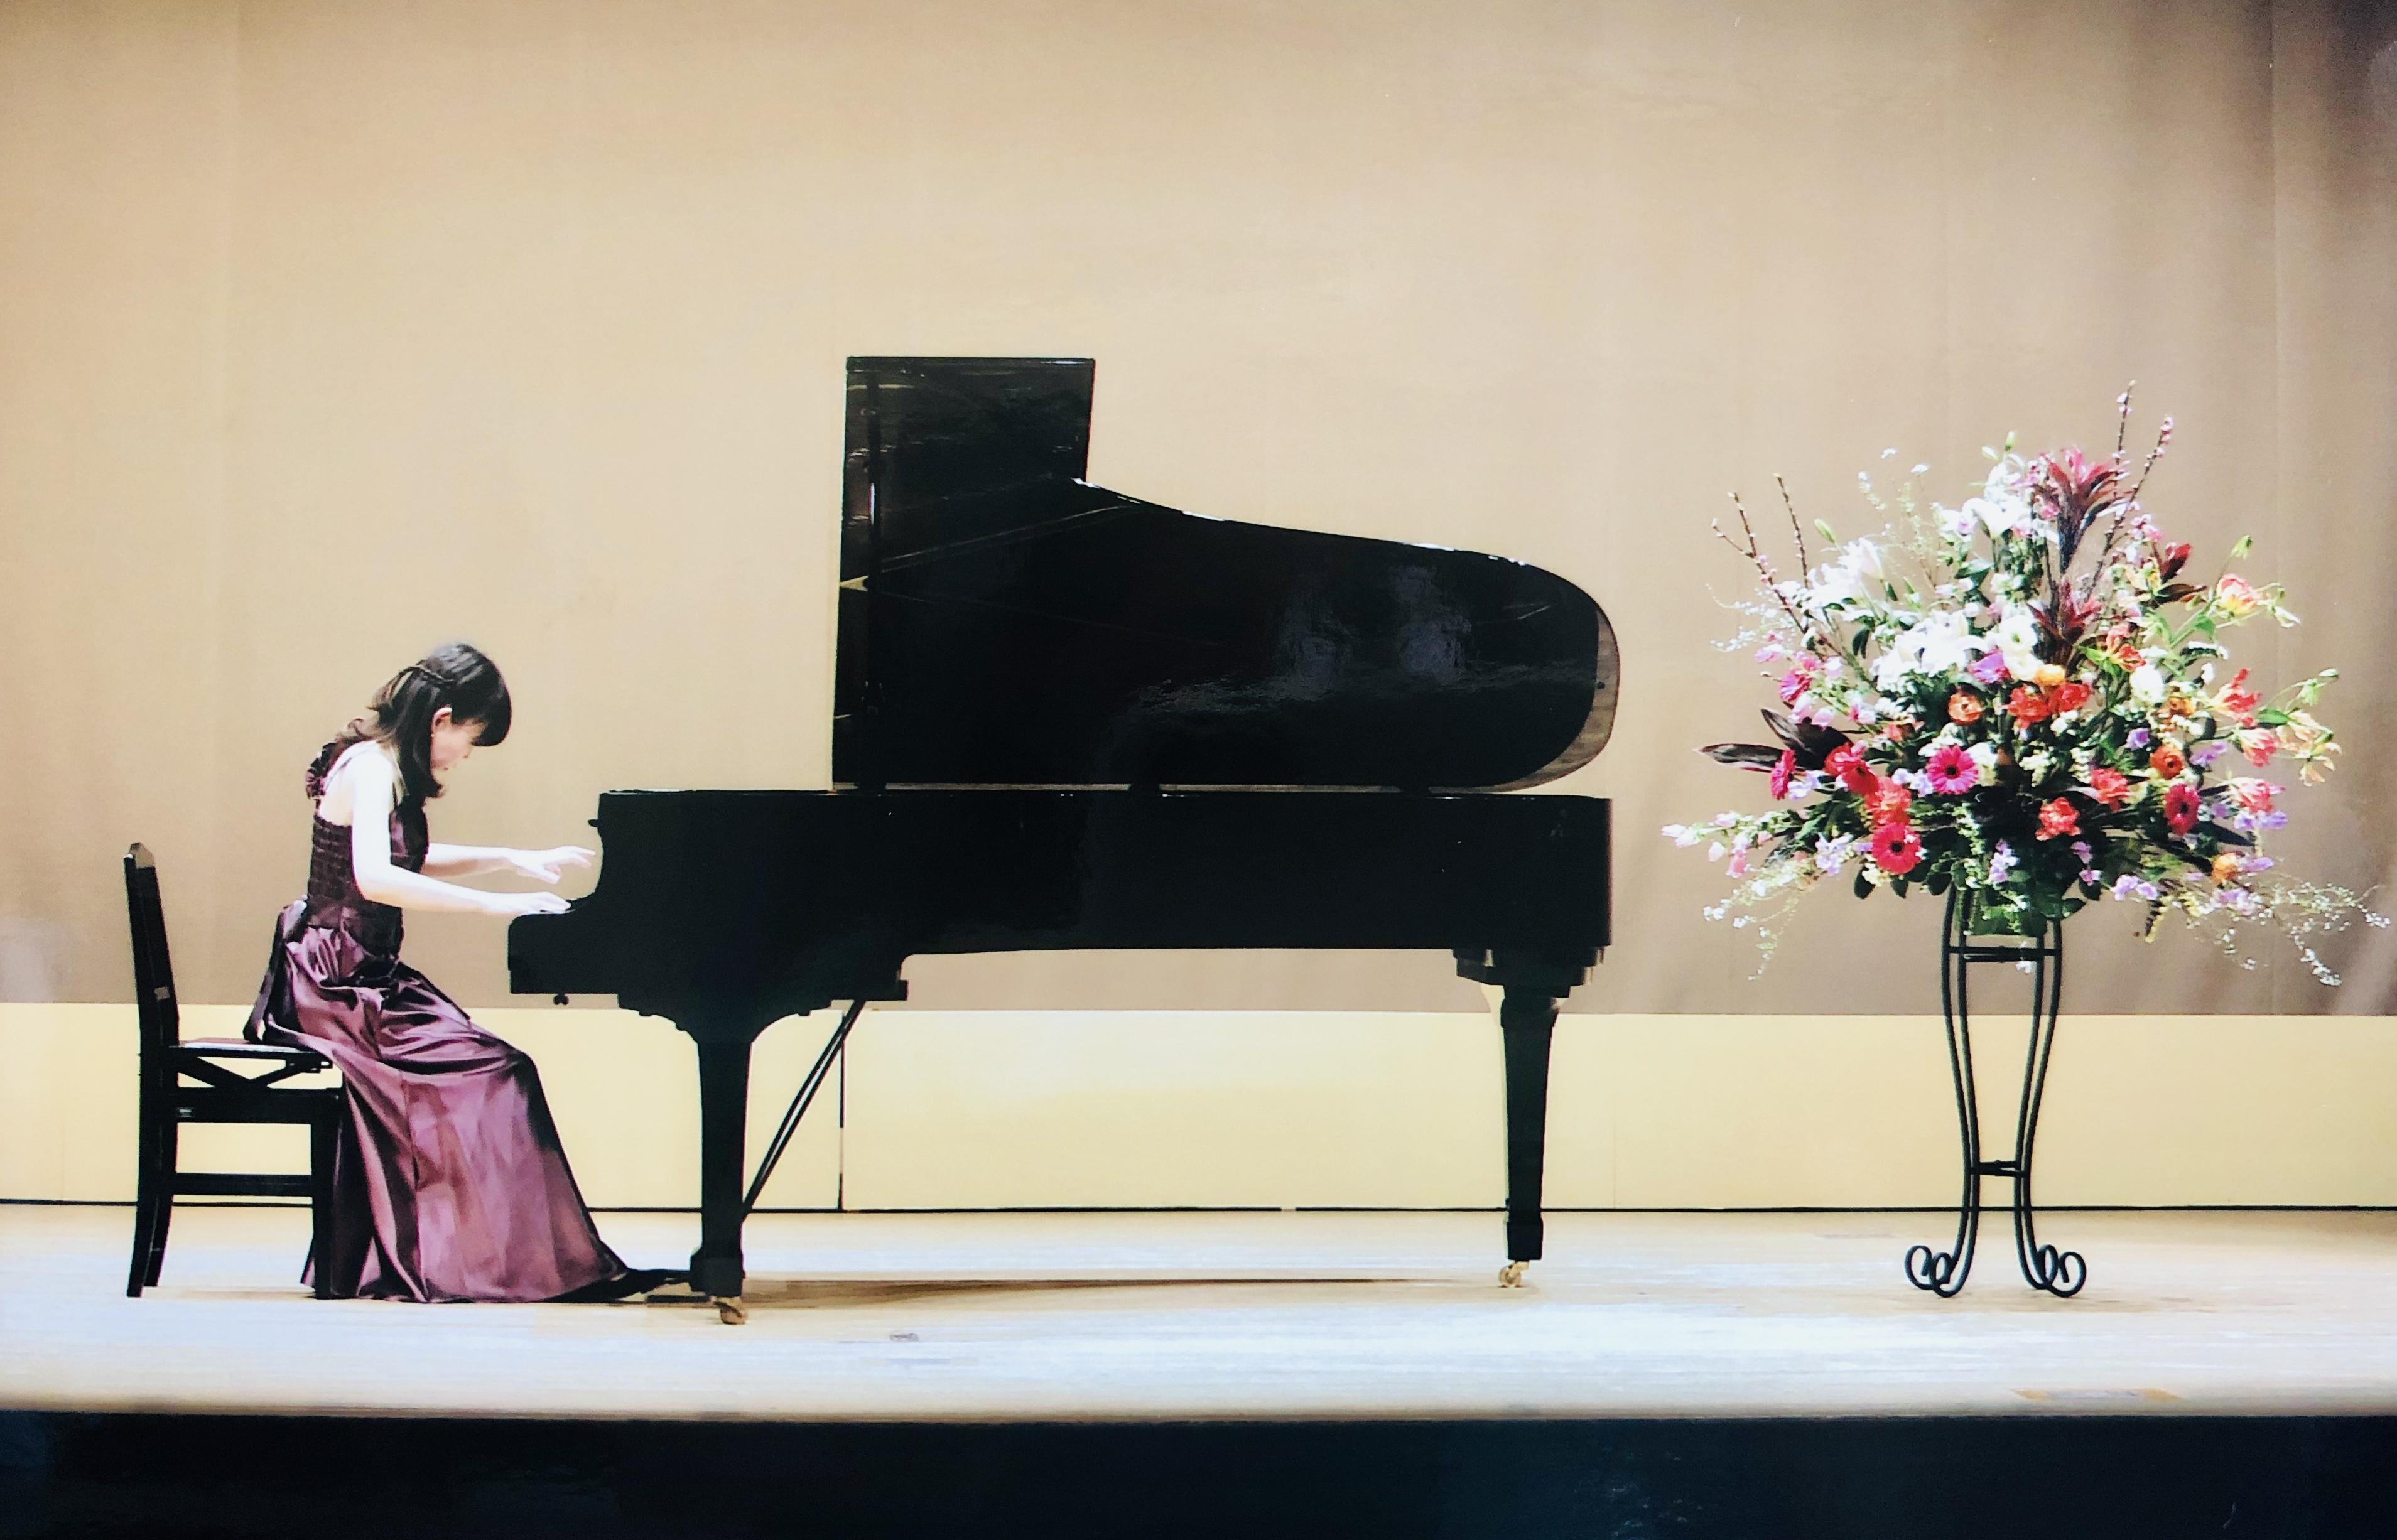 picoピアノ演奏写真その2